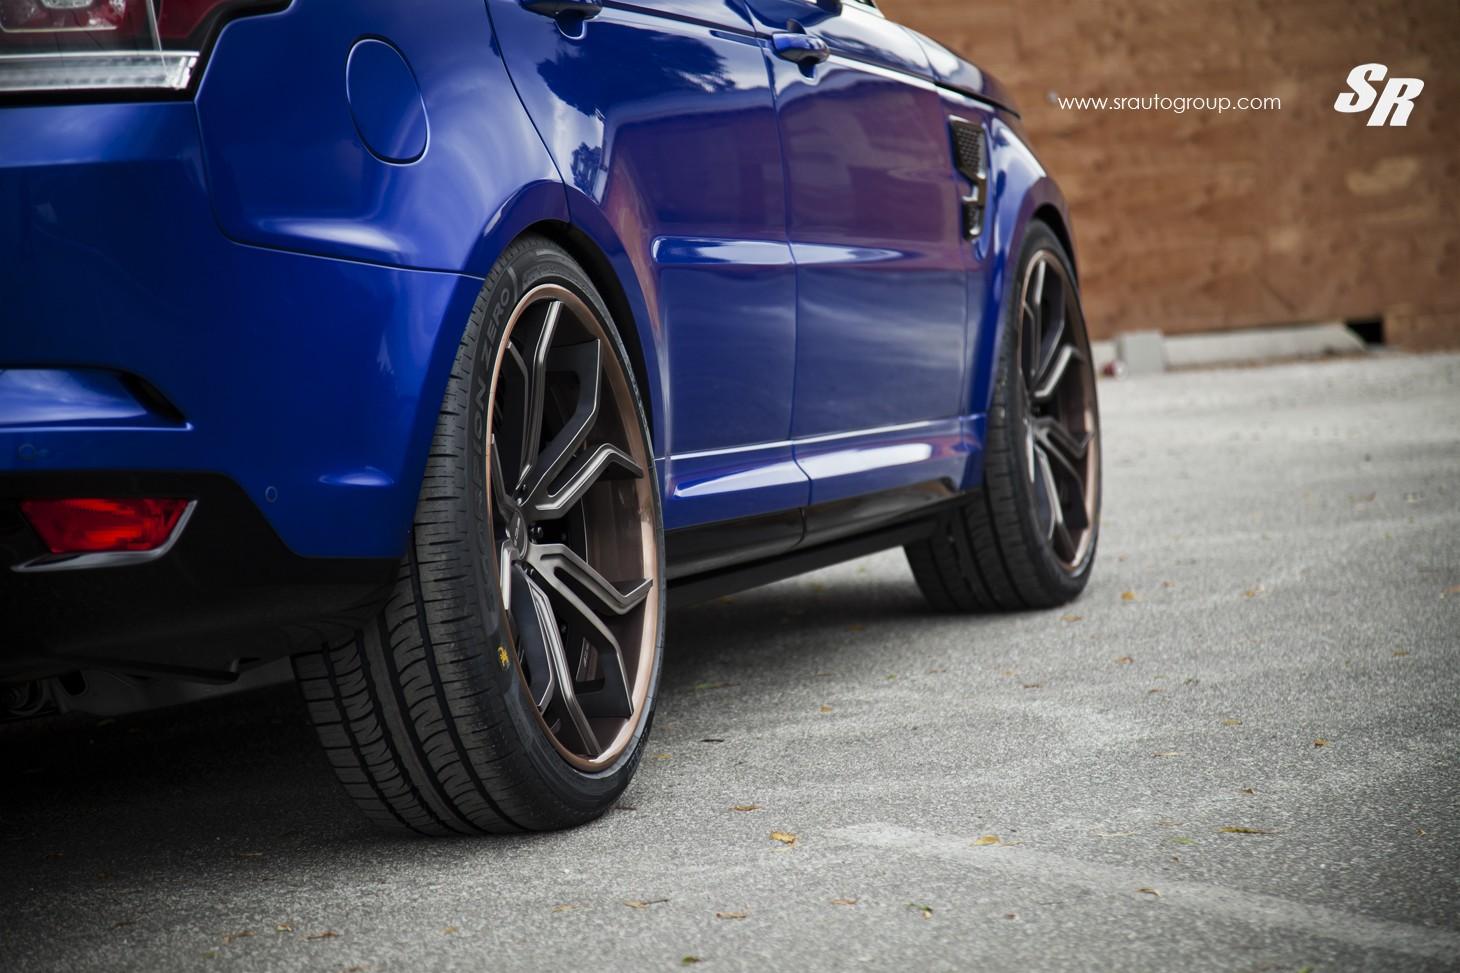 Range Rover Sport Svr On Pur Wheels British Swag